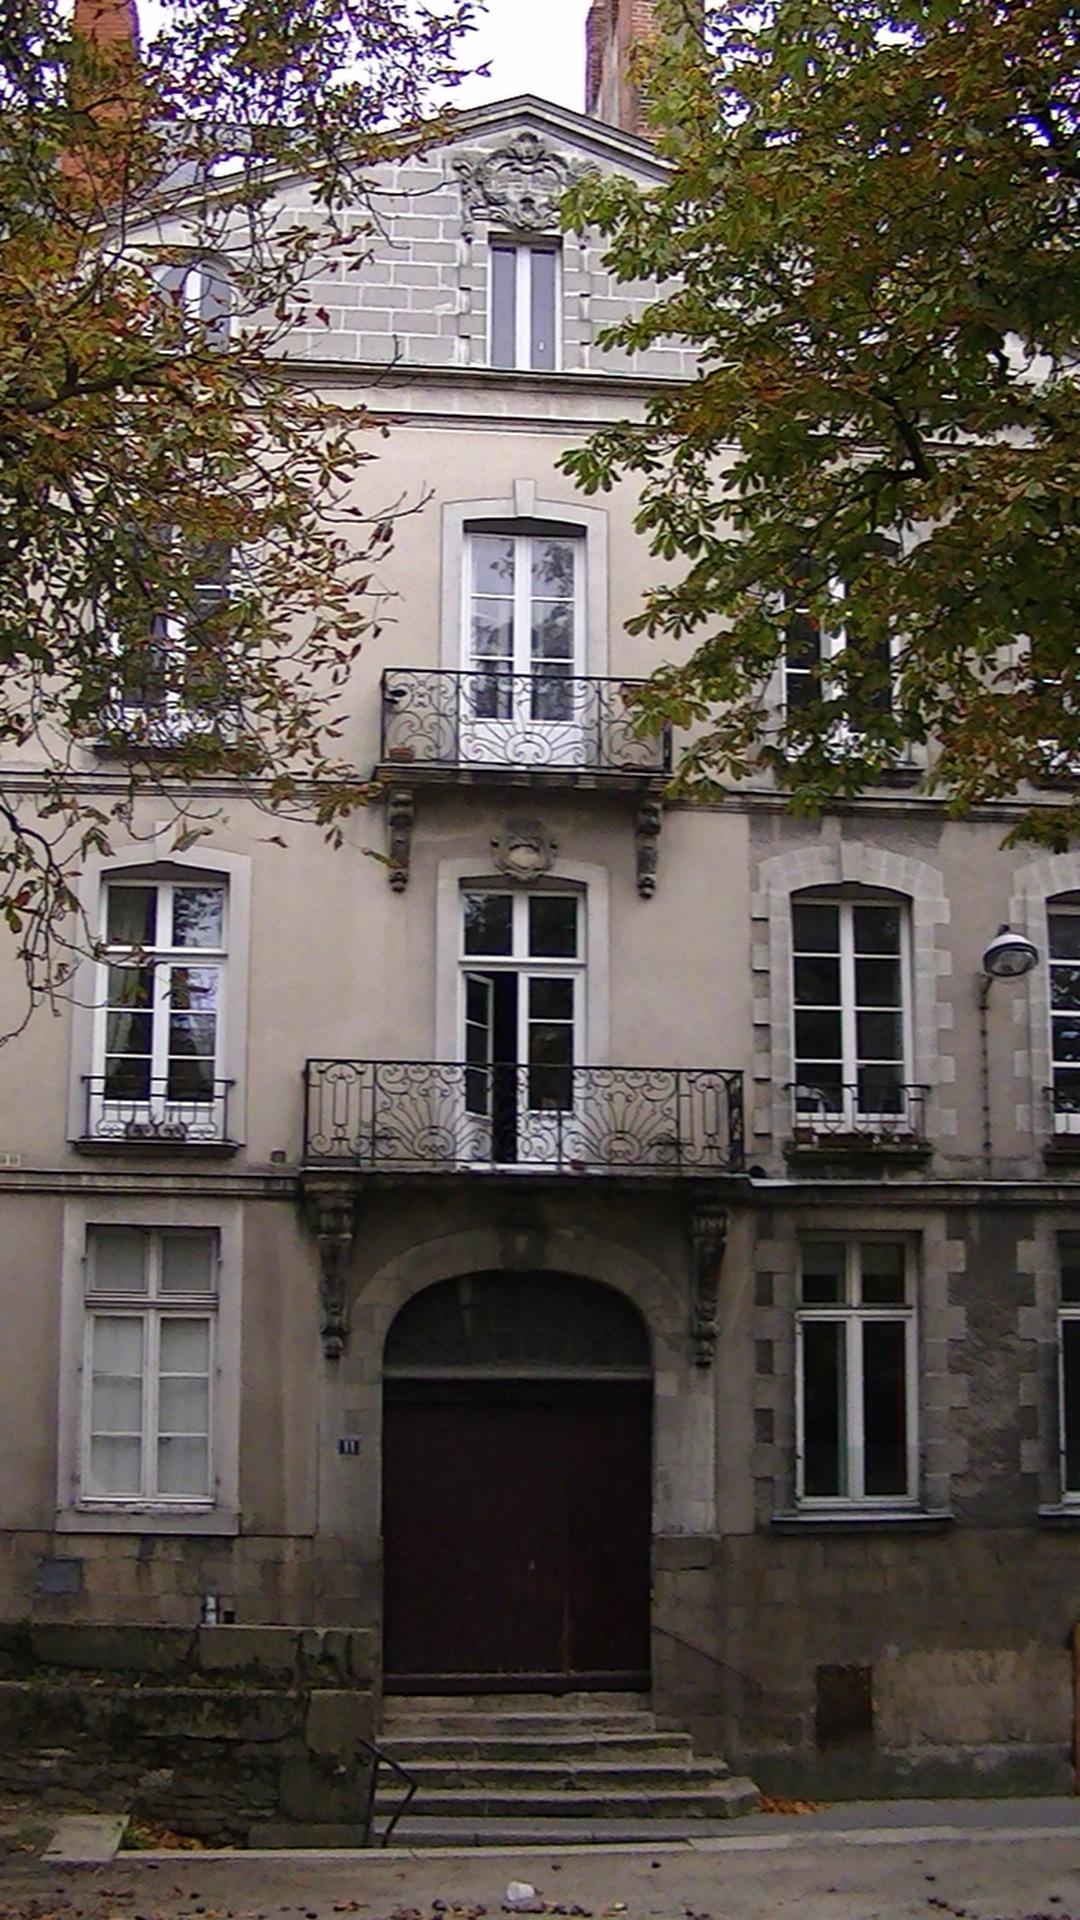 Maison min e wikip dia for 11 rue maison blanche nantes